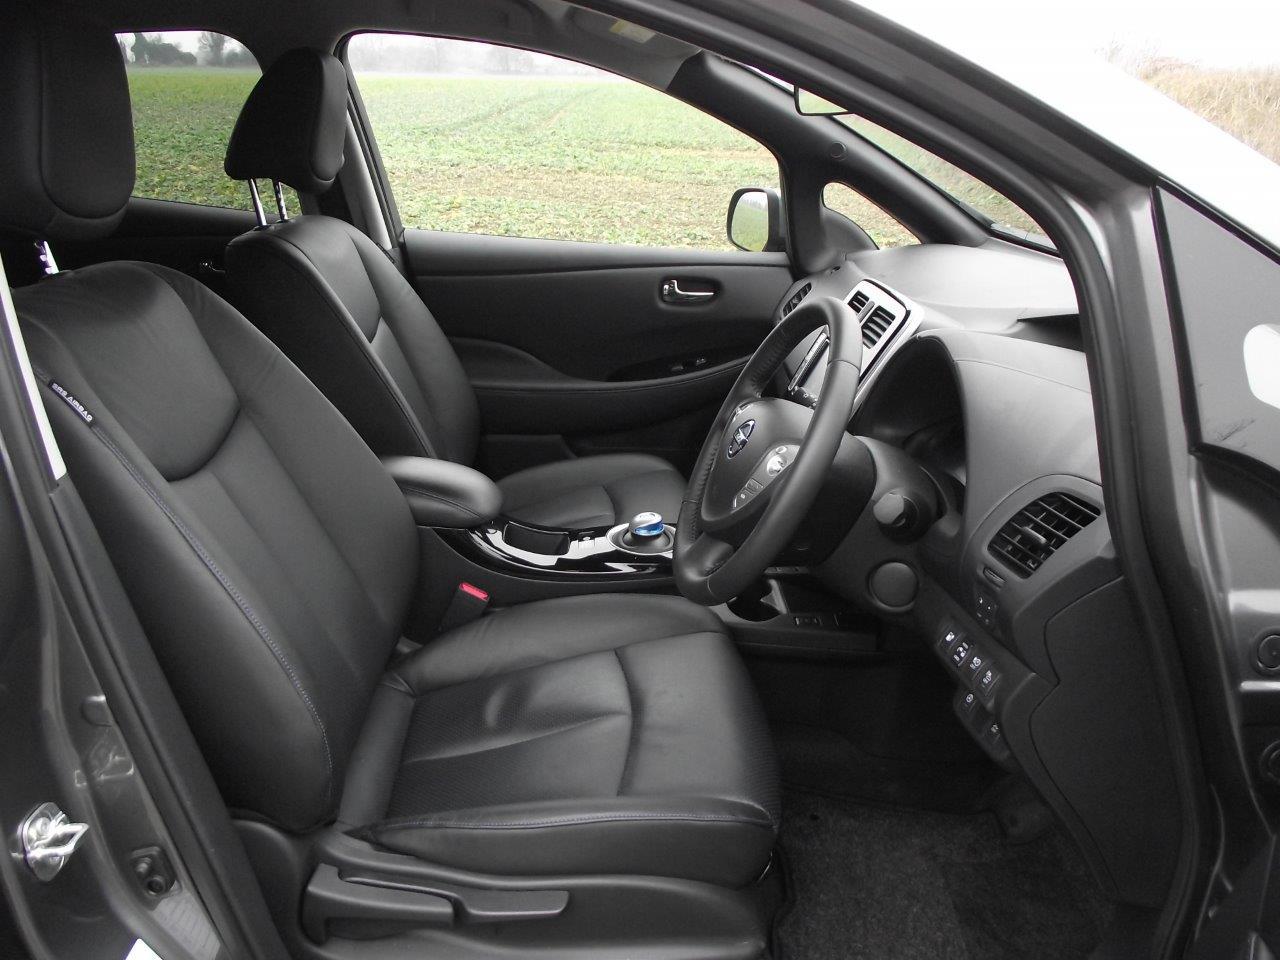 Nissan Leaf drivers seat